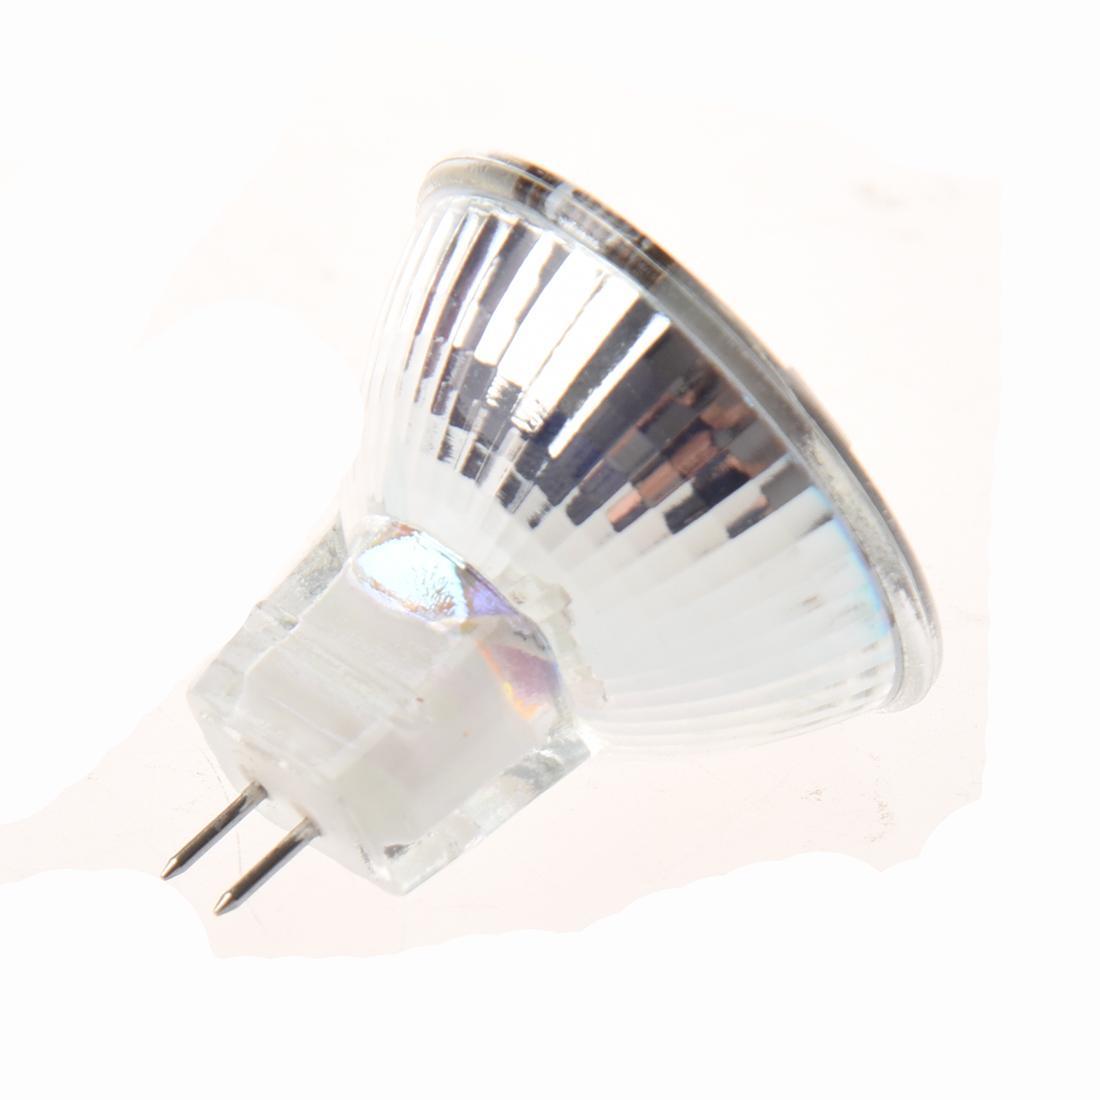 5x sodial r 7w mr11 gu4 600lm led birne lampe 15 5630 smd warmweiss licht j5. Black Bedroom Furniture Sets. Home Design Ideas